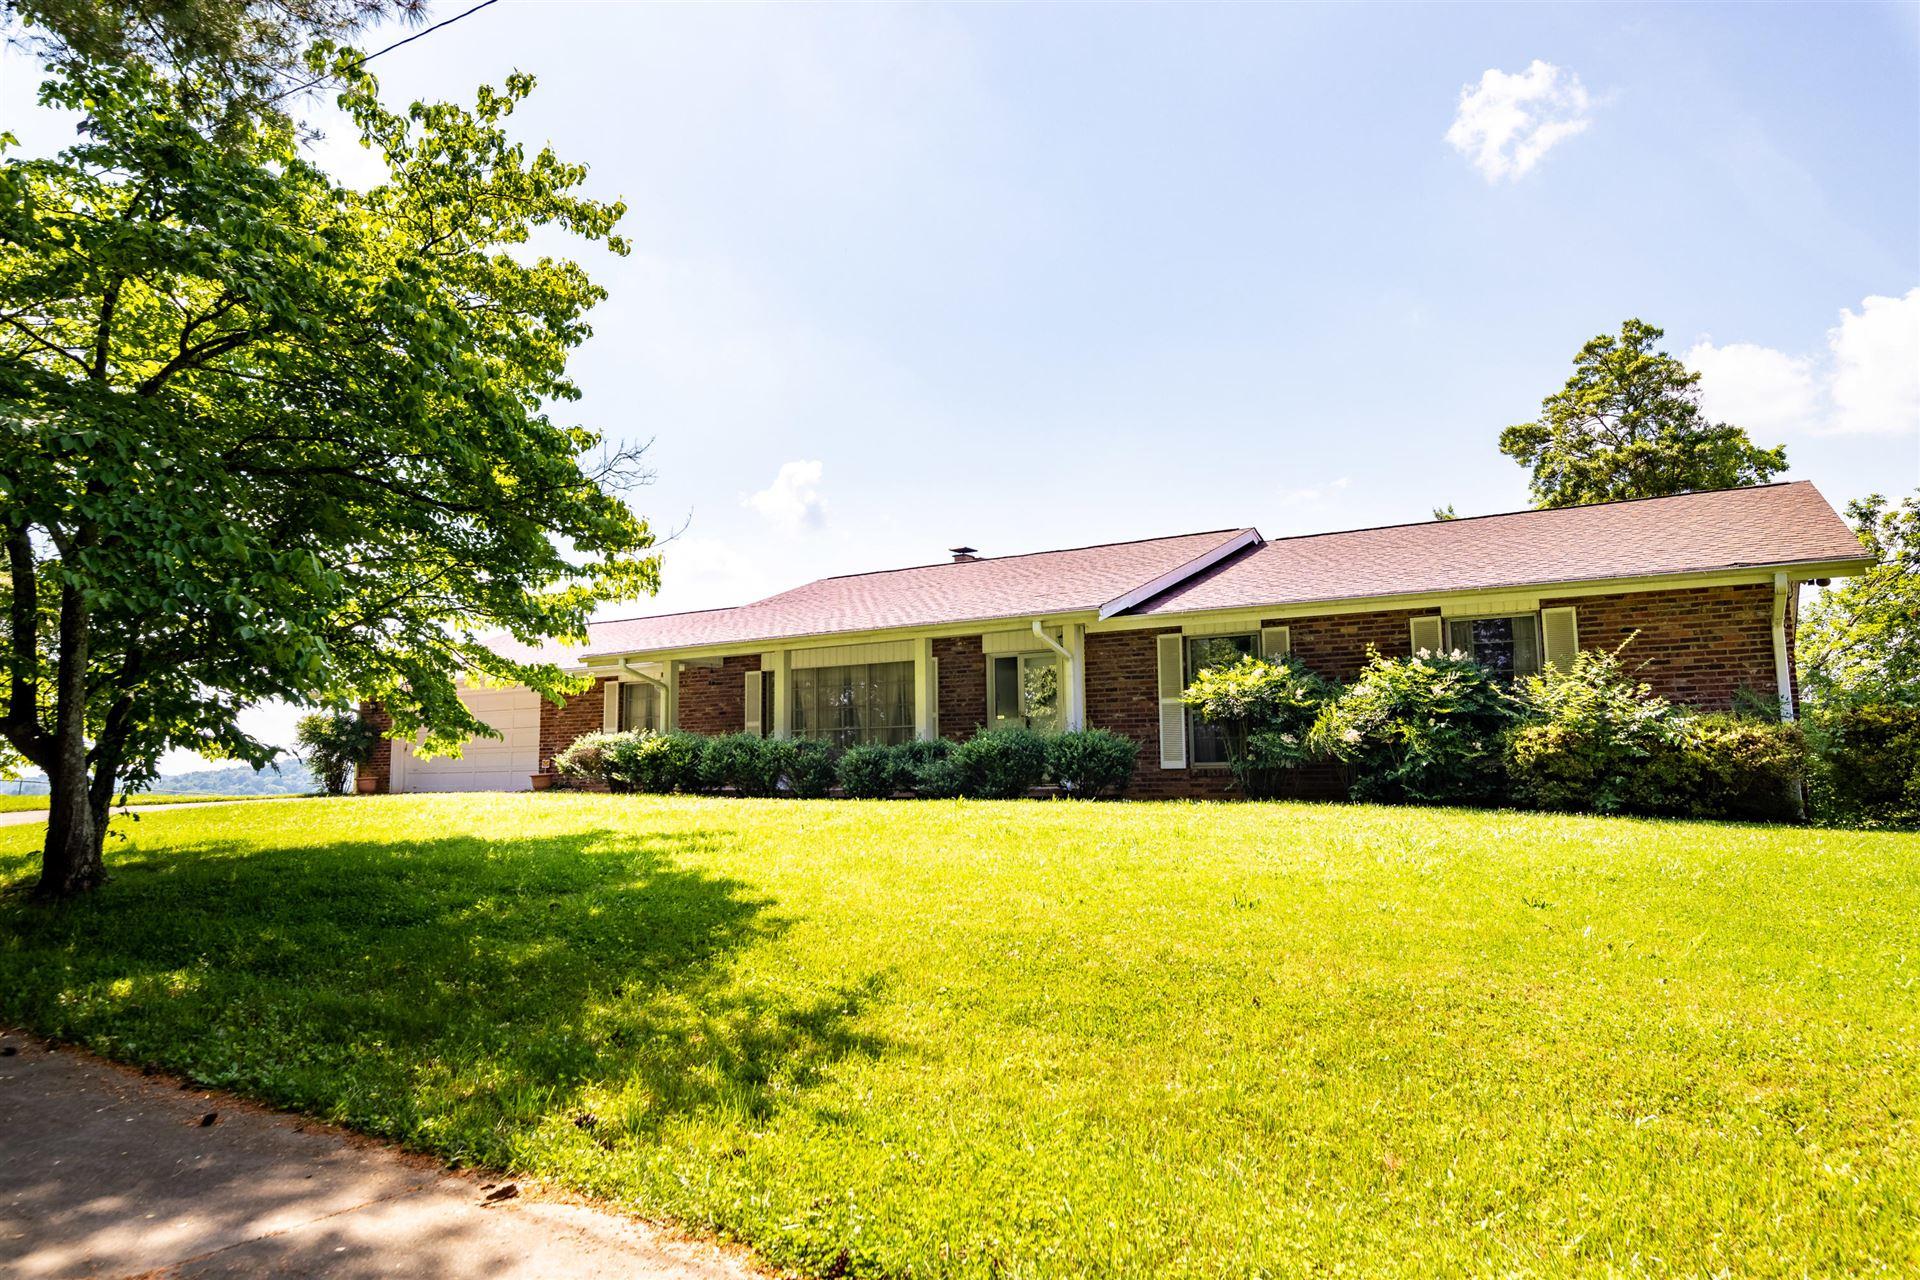 Photo of 2079 Lakeview Rd, Lenoir City, TN 37772 (MLS # 1119667)